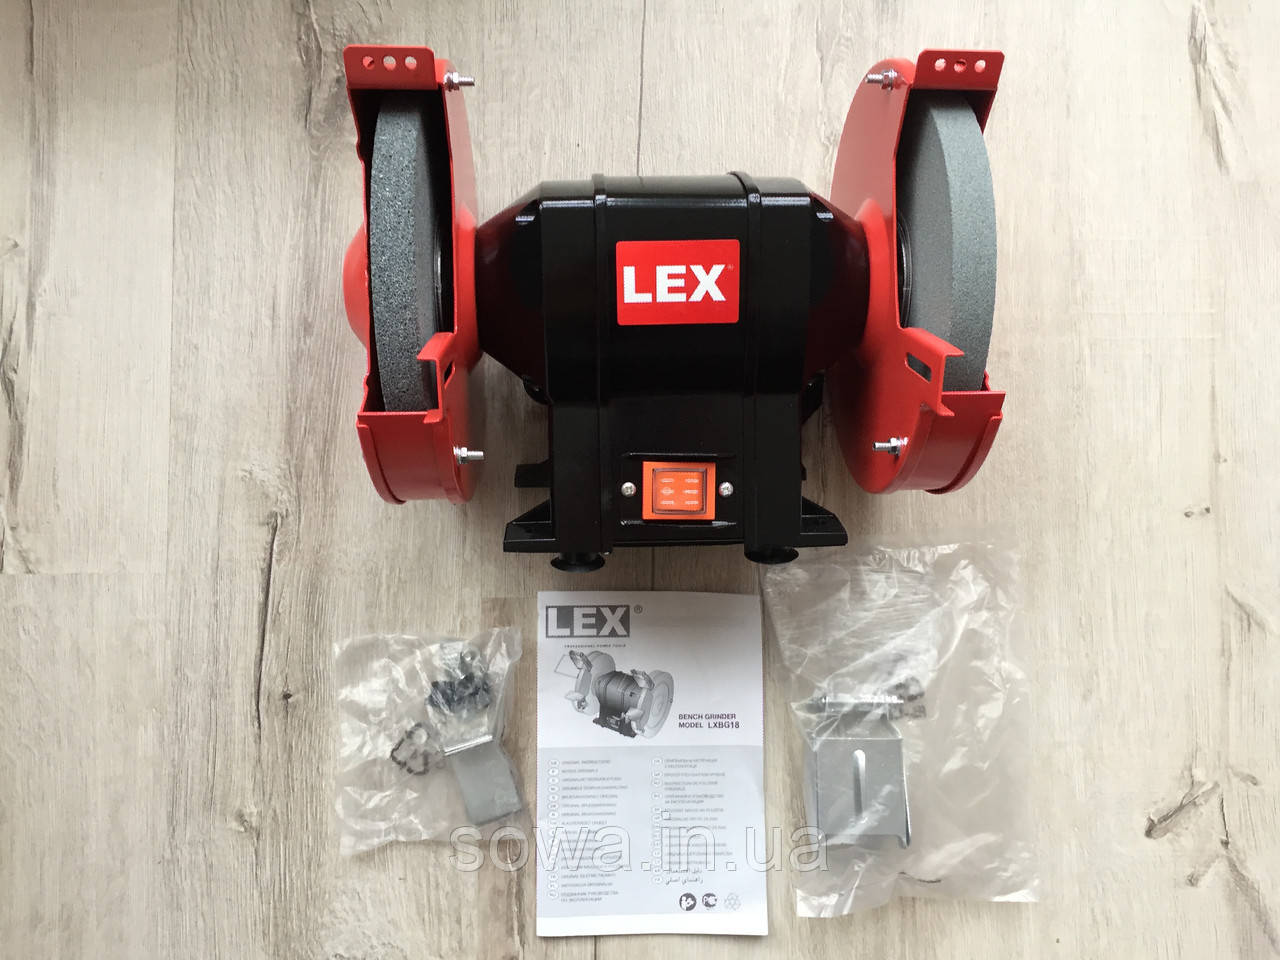 ✔️ Точило Lex LXBG18  _  200мм, 1800Вт